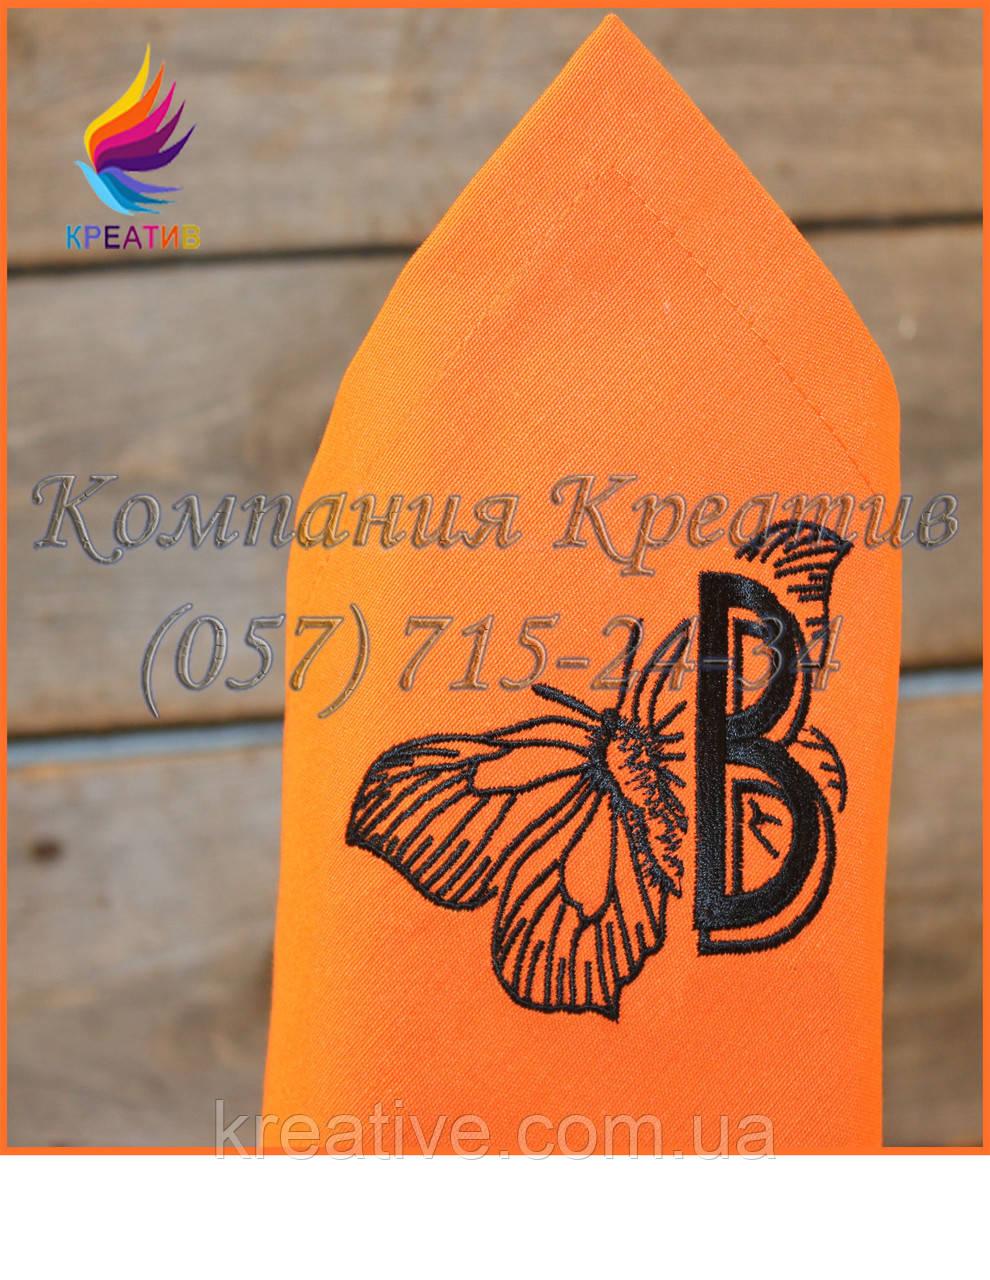 Салфетки с Вашим логотипом (под заказ от 50 шт)